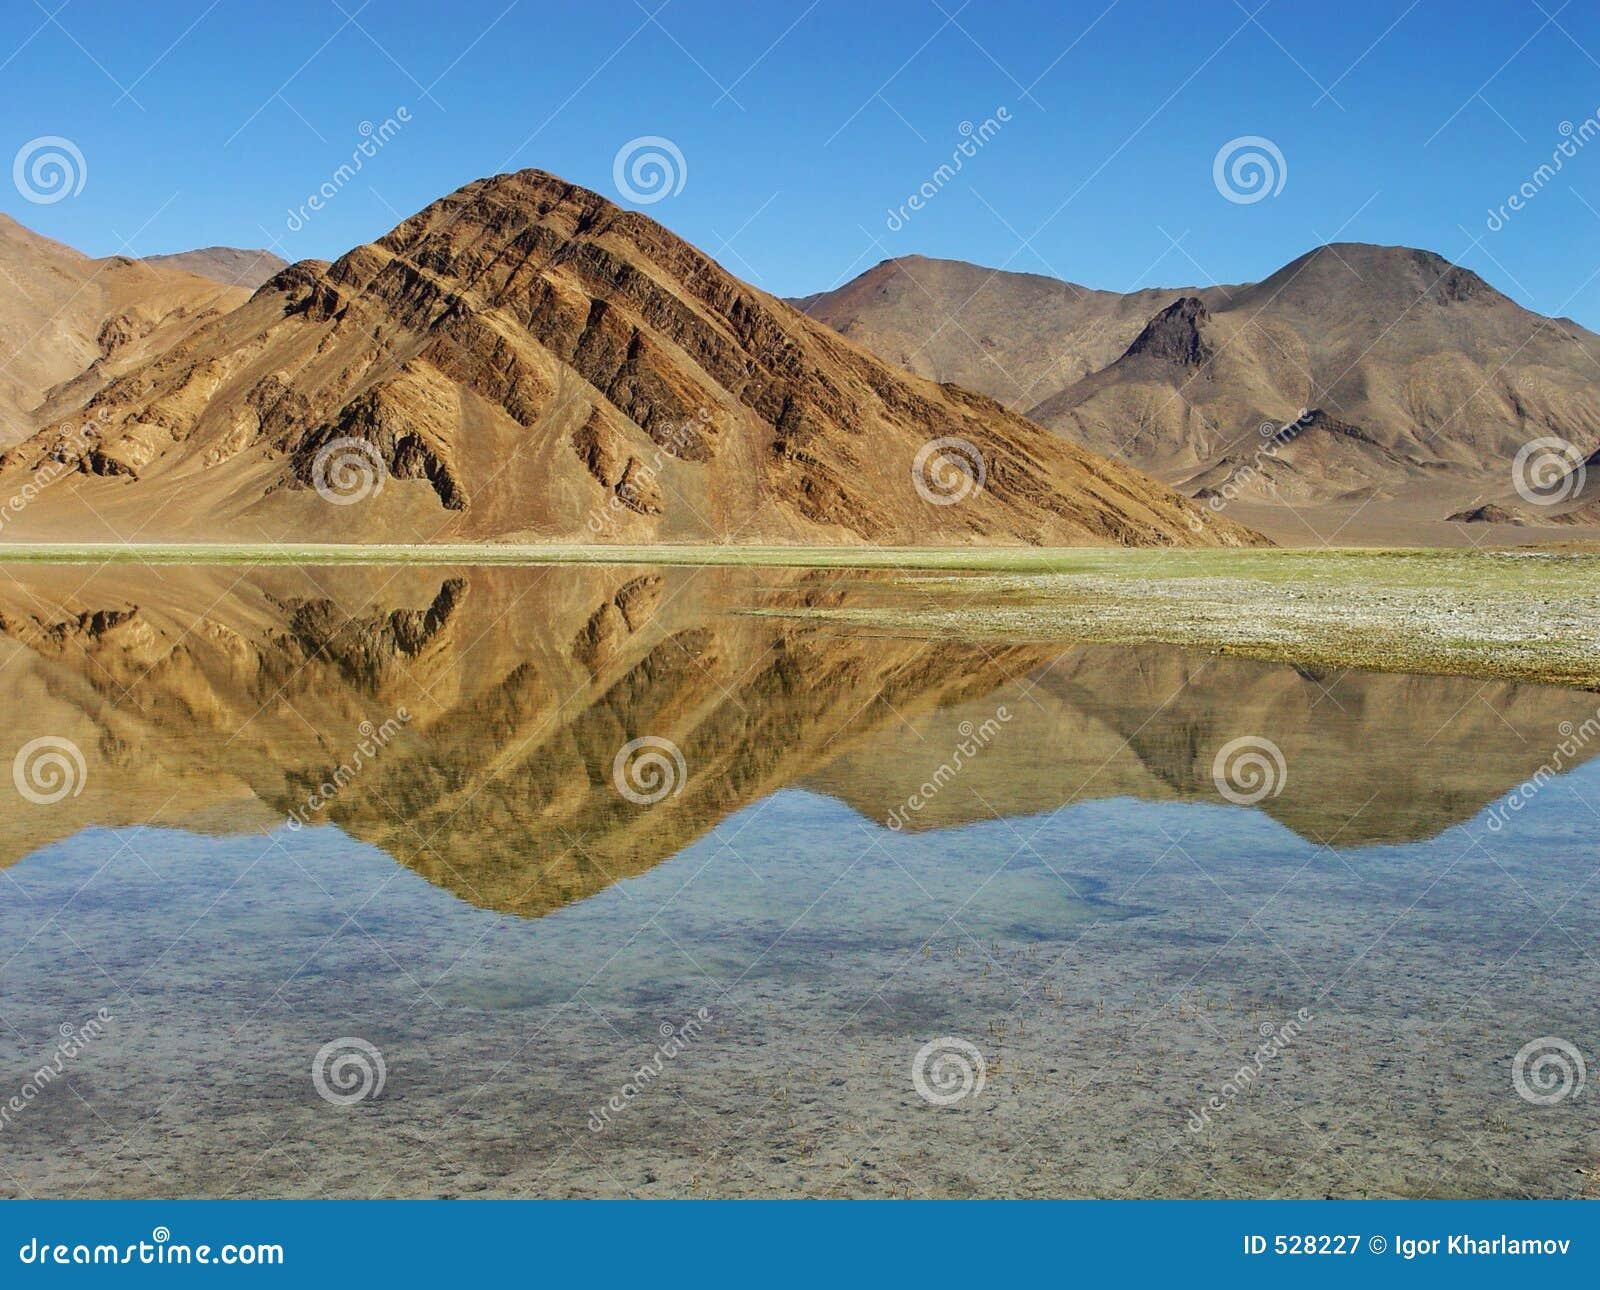 Download 山反映 库存图片. 图片 包括有 旅游业, 横向, 蓝色, 反映, 红色, beautifuler, 黄色, 形成 - 528227